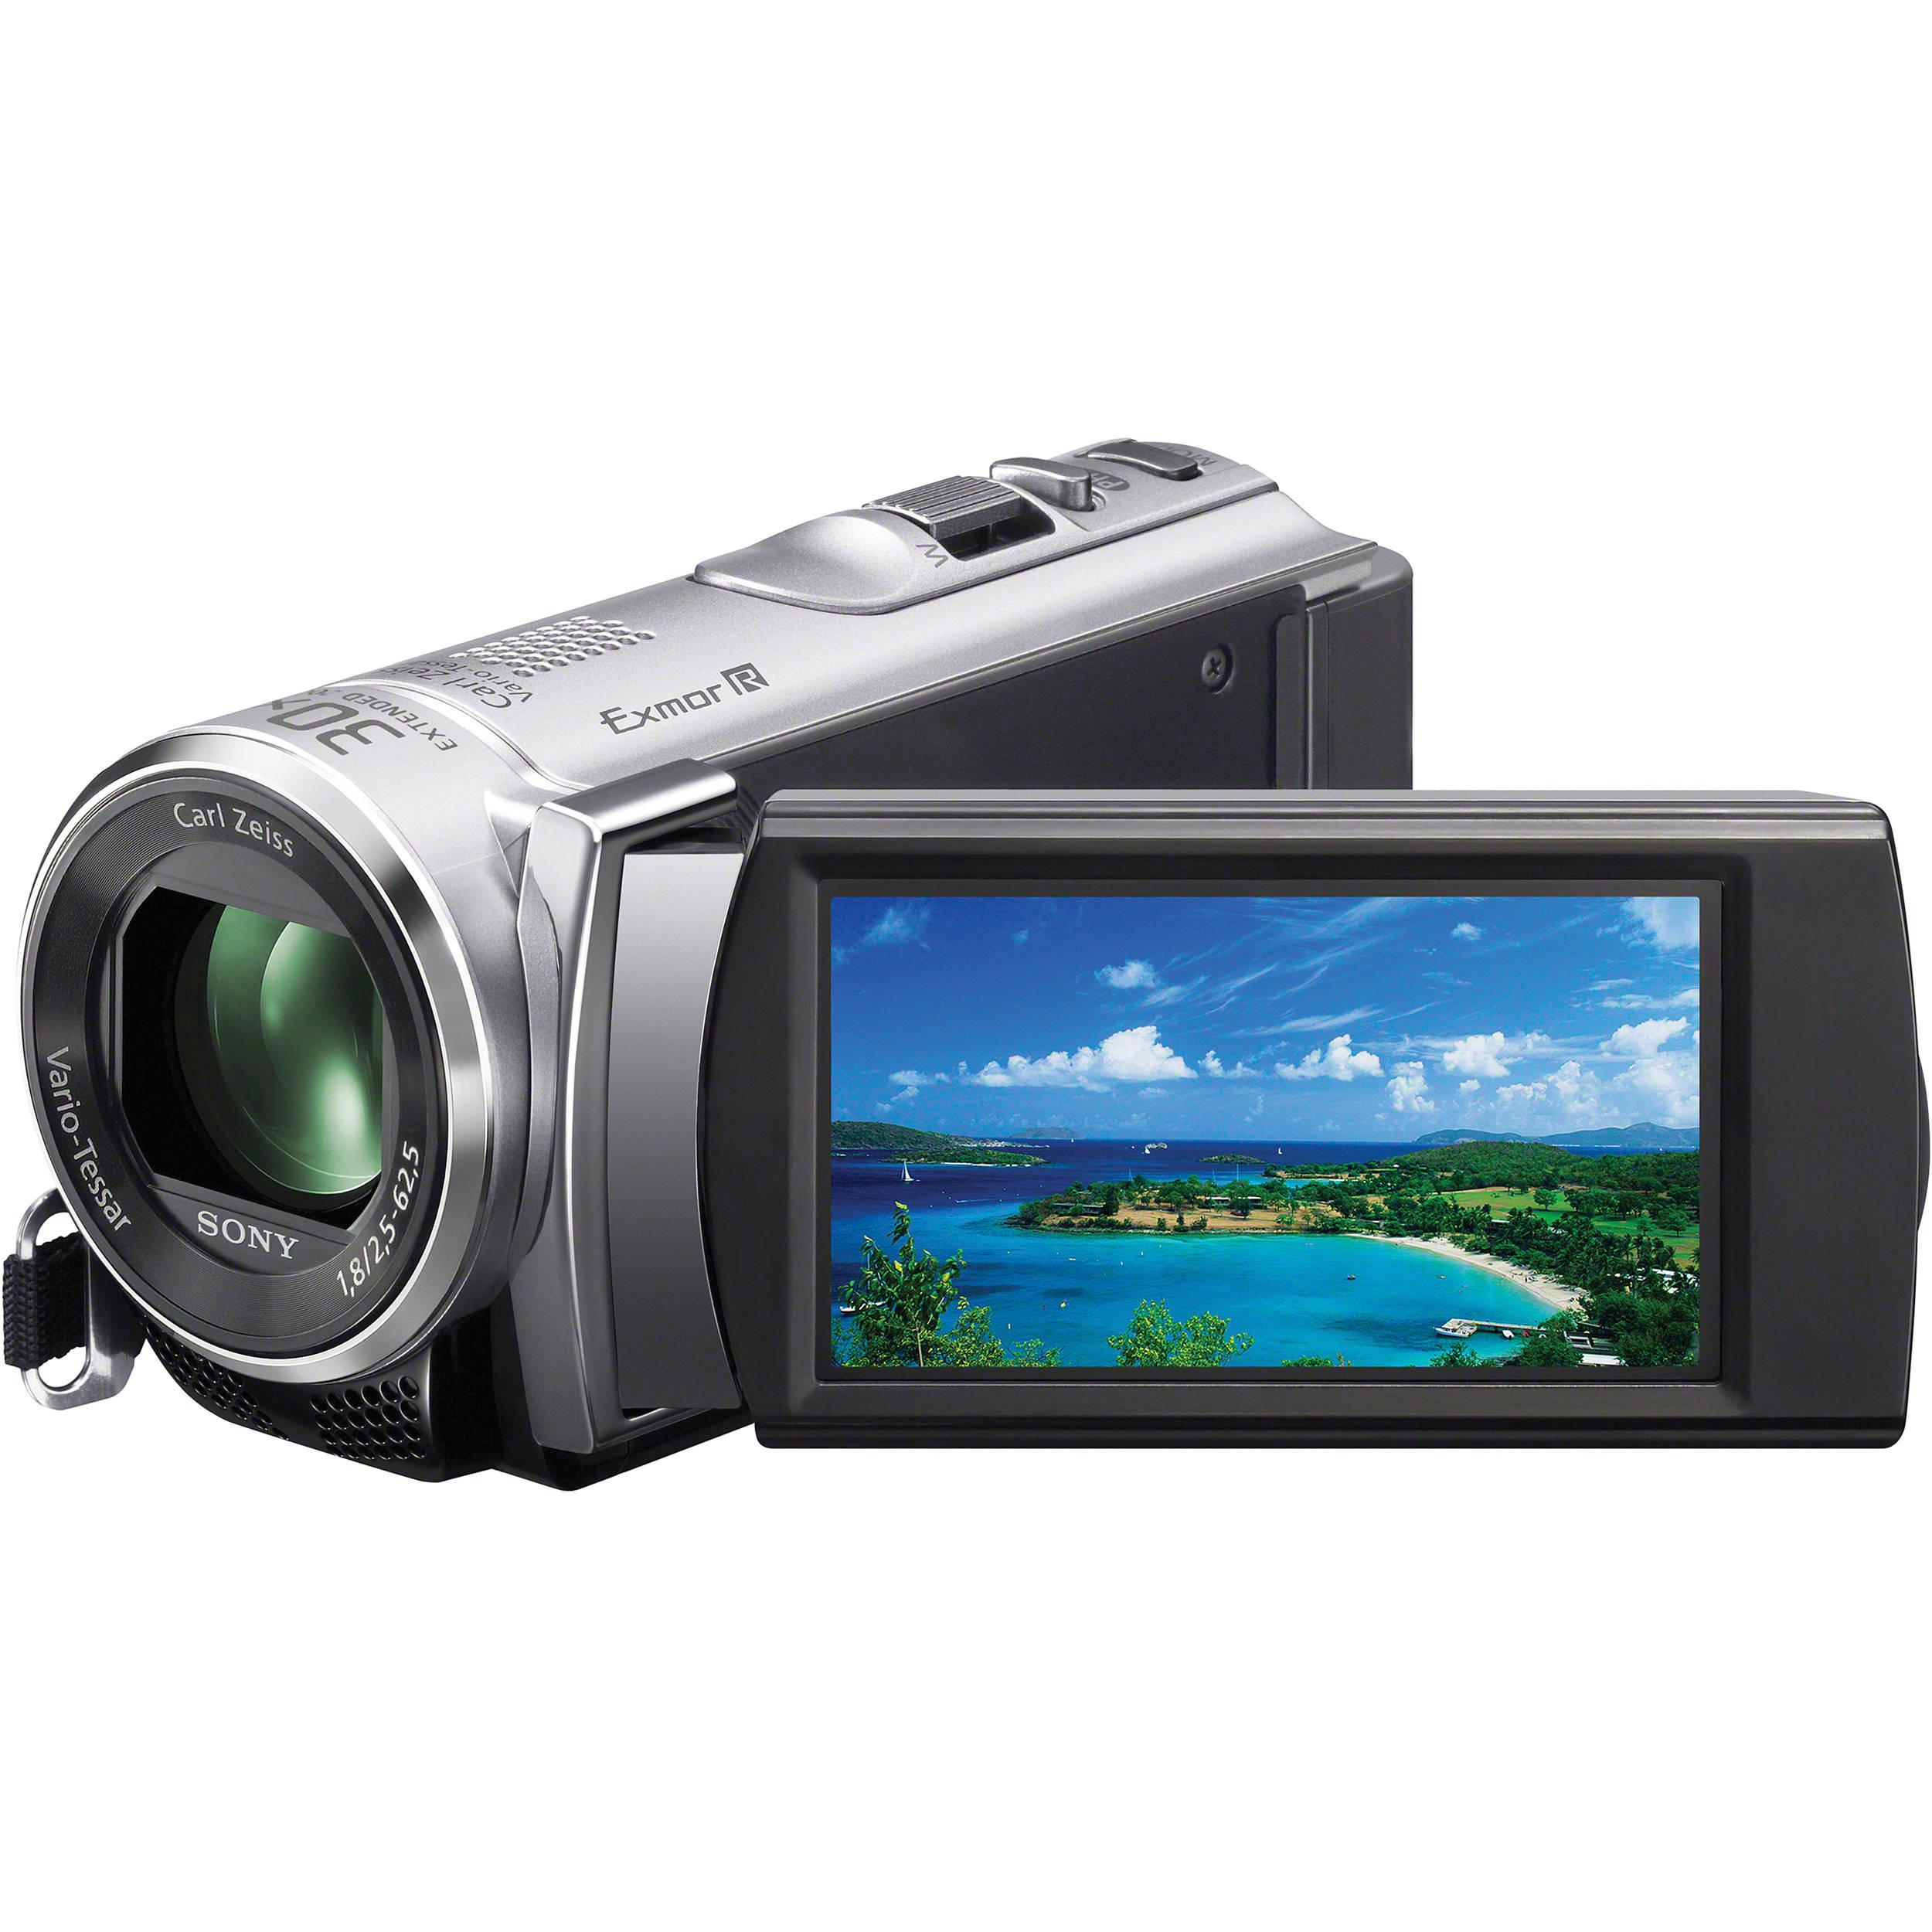 sony hdr cx210 high definition handycam camcorder hdrcx210 s b h rh bhphotovideo com High-Tech Sony Camcorder 800 Sony Camcorder